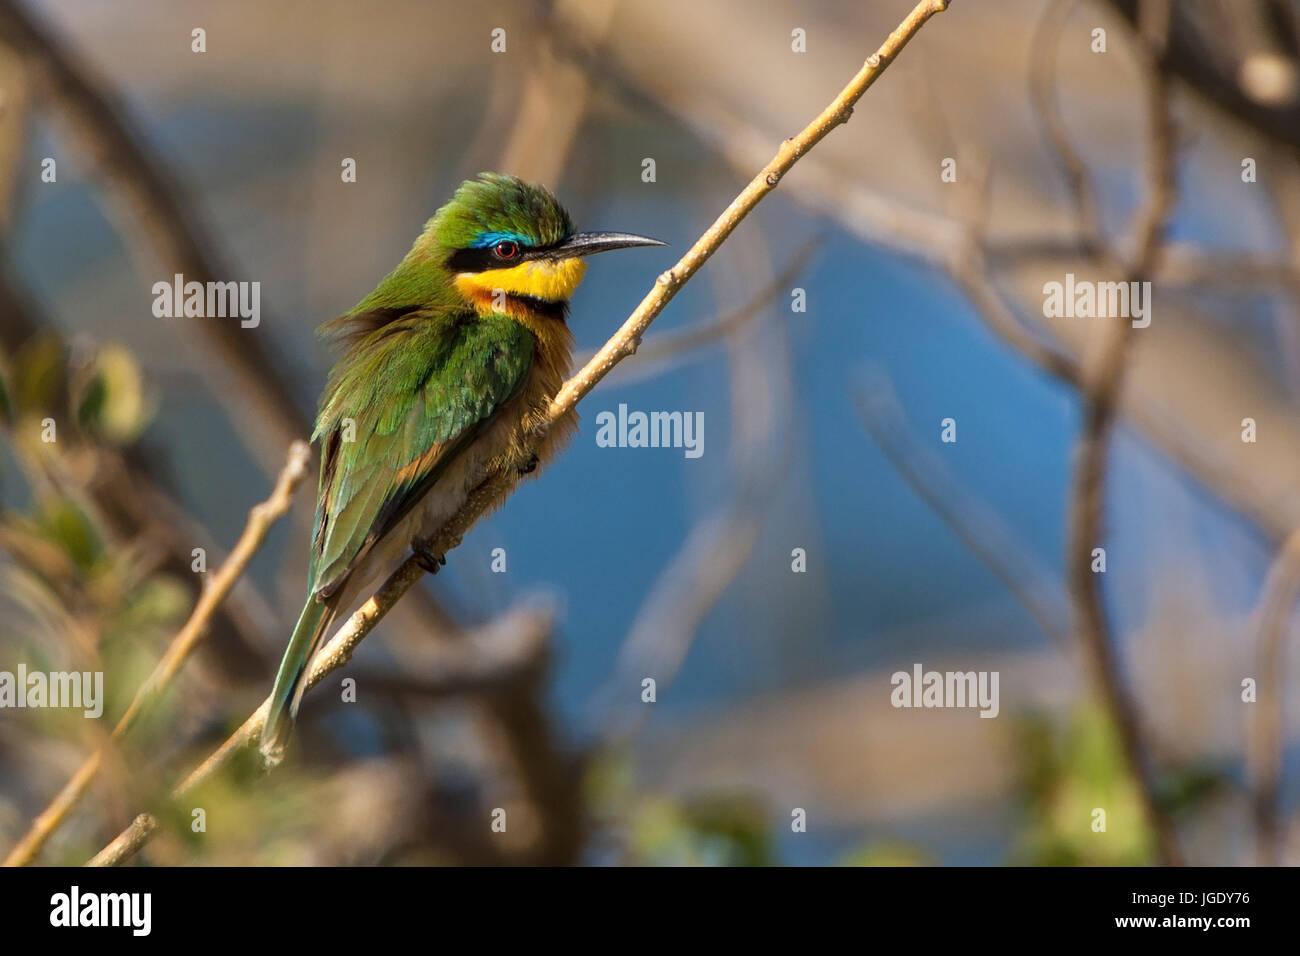 Midget pint, Merops pusillus, Zwergspint (Merops pusillus) - Stock Image